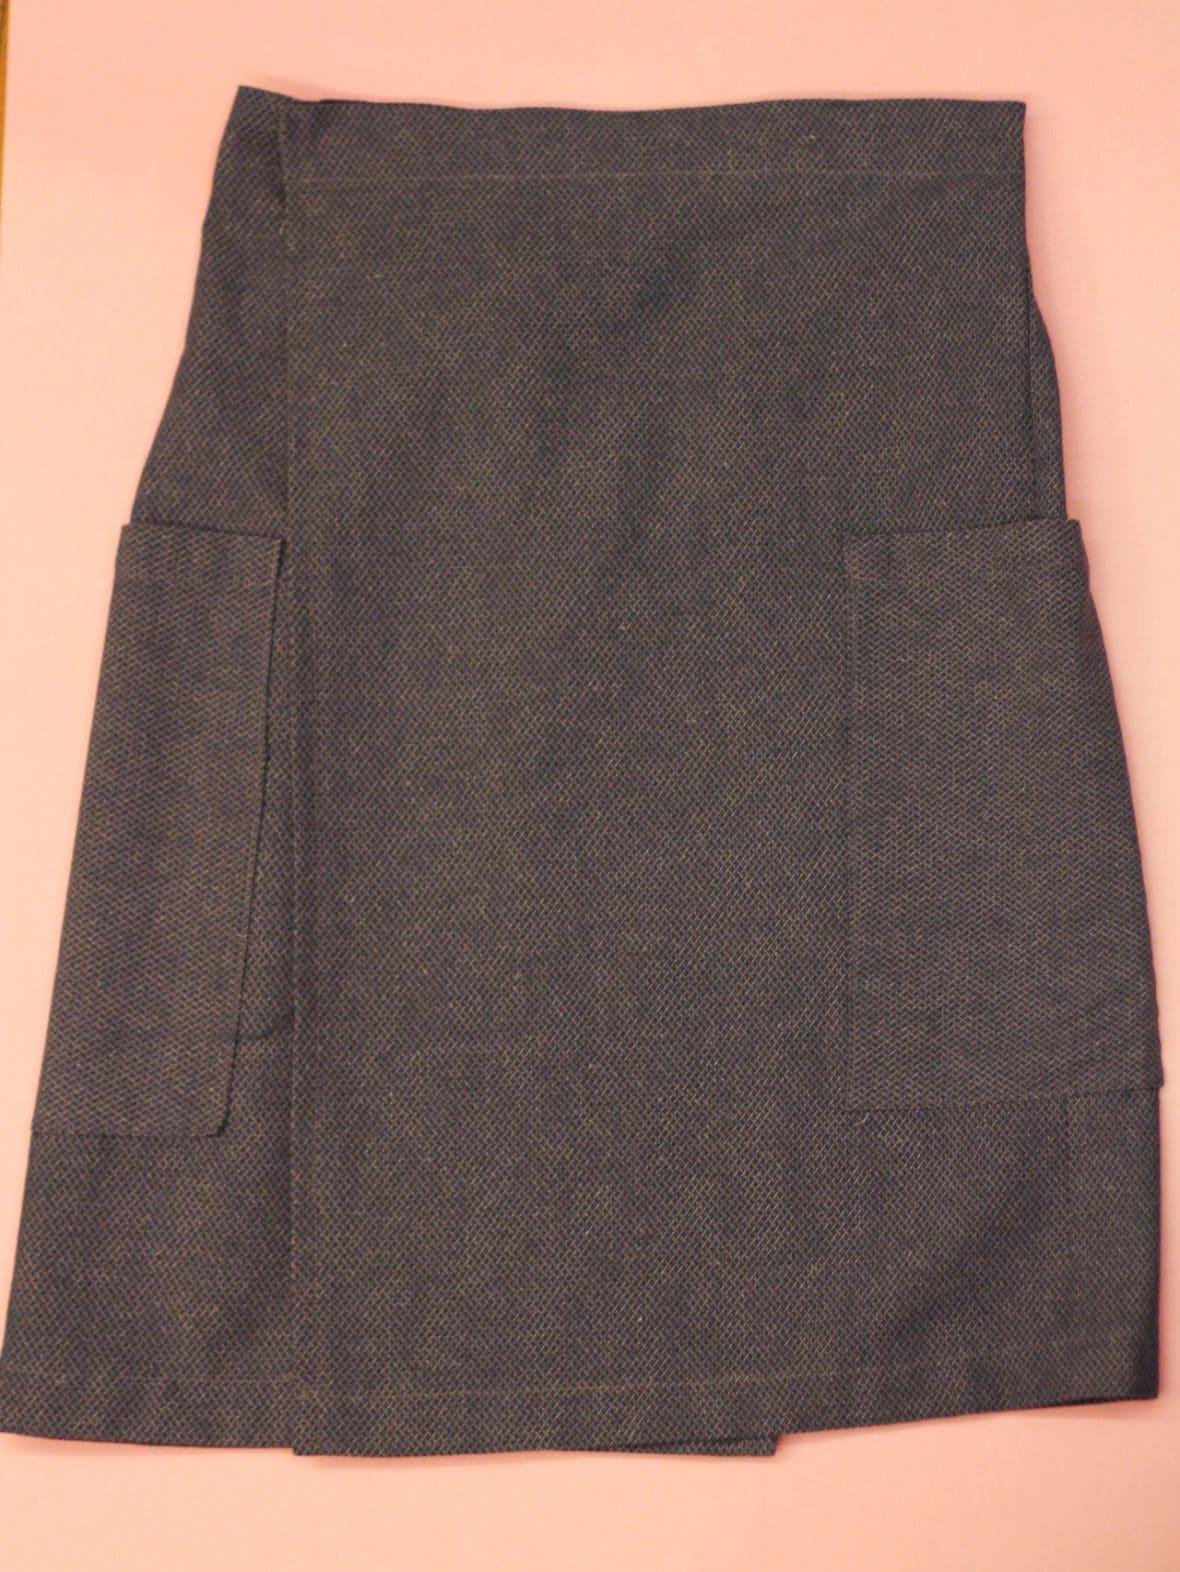 Wrap skirt DIY - how to make a wrap skirt